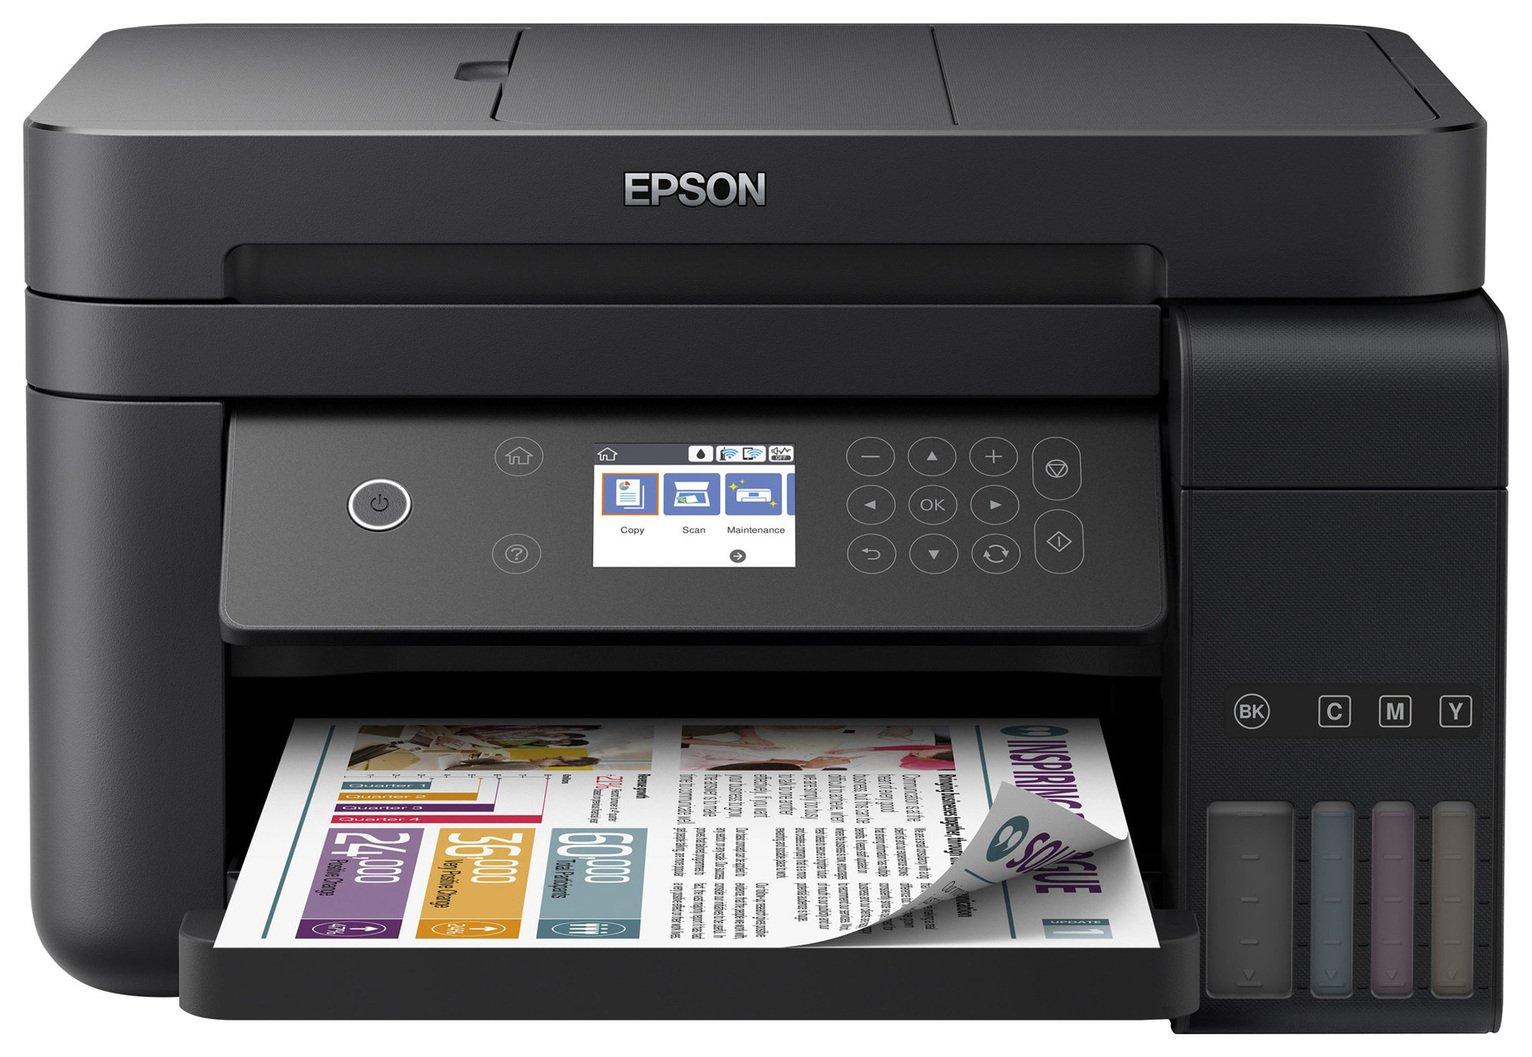 Epson EcoTank ET-3750 Wireless Ink Tank Printer